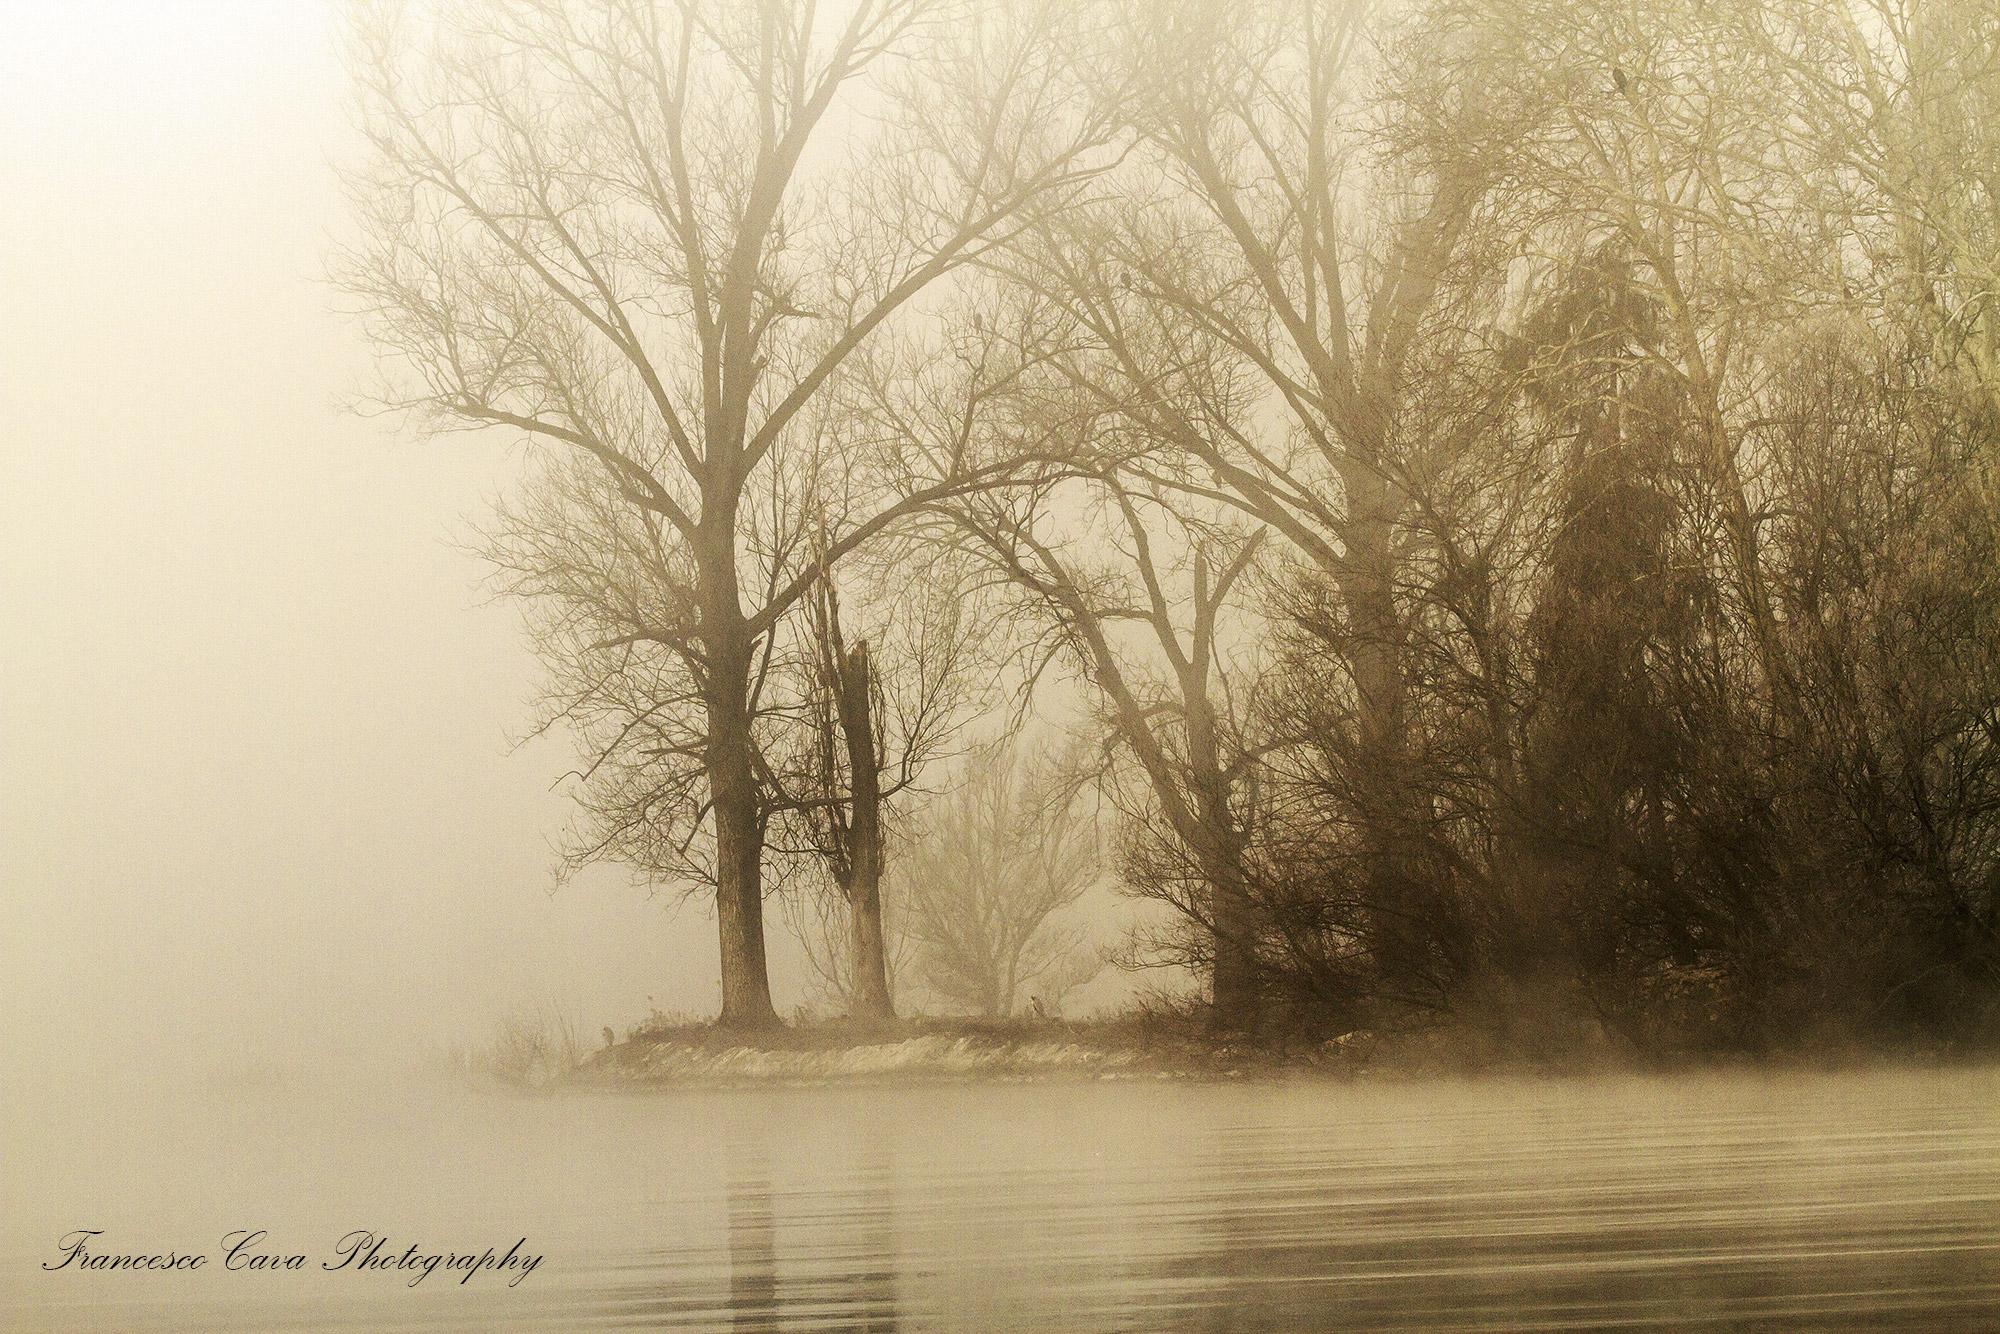 In the fog .........